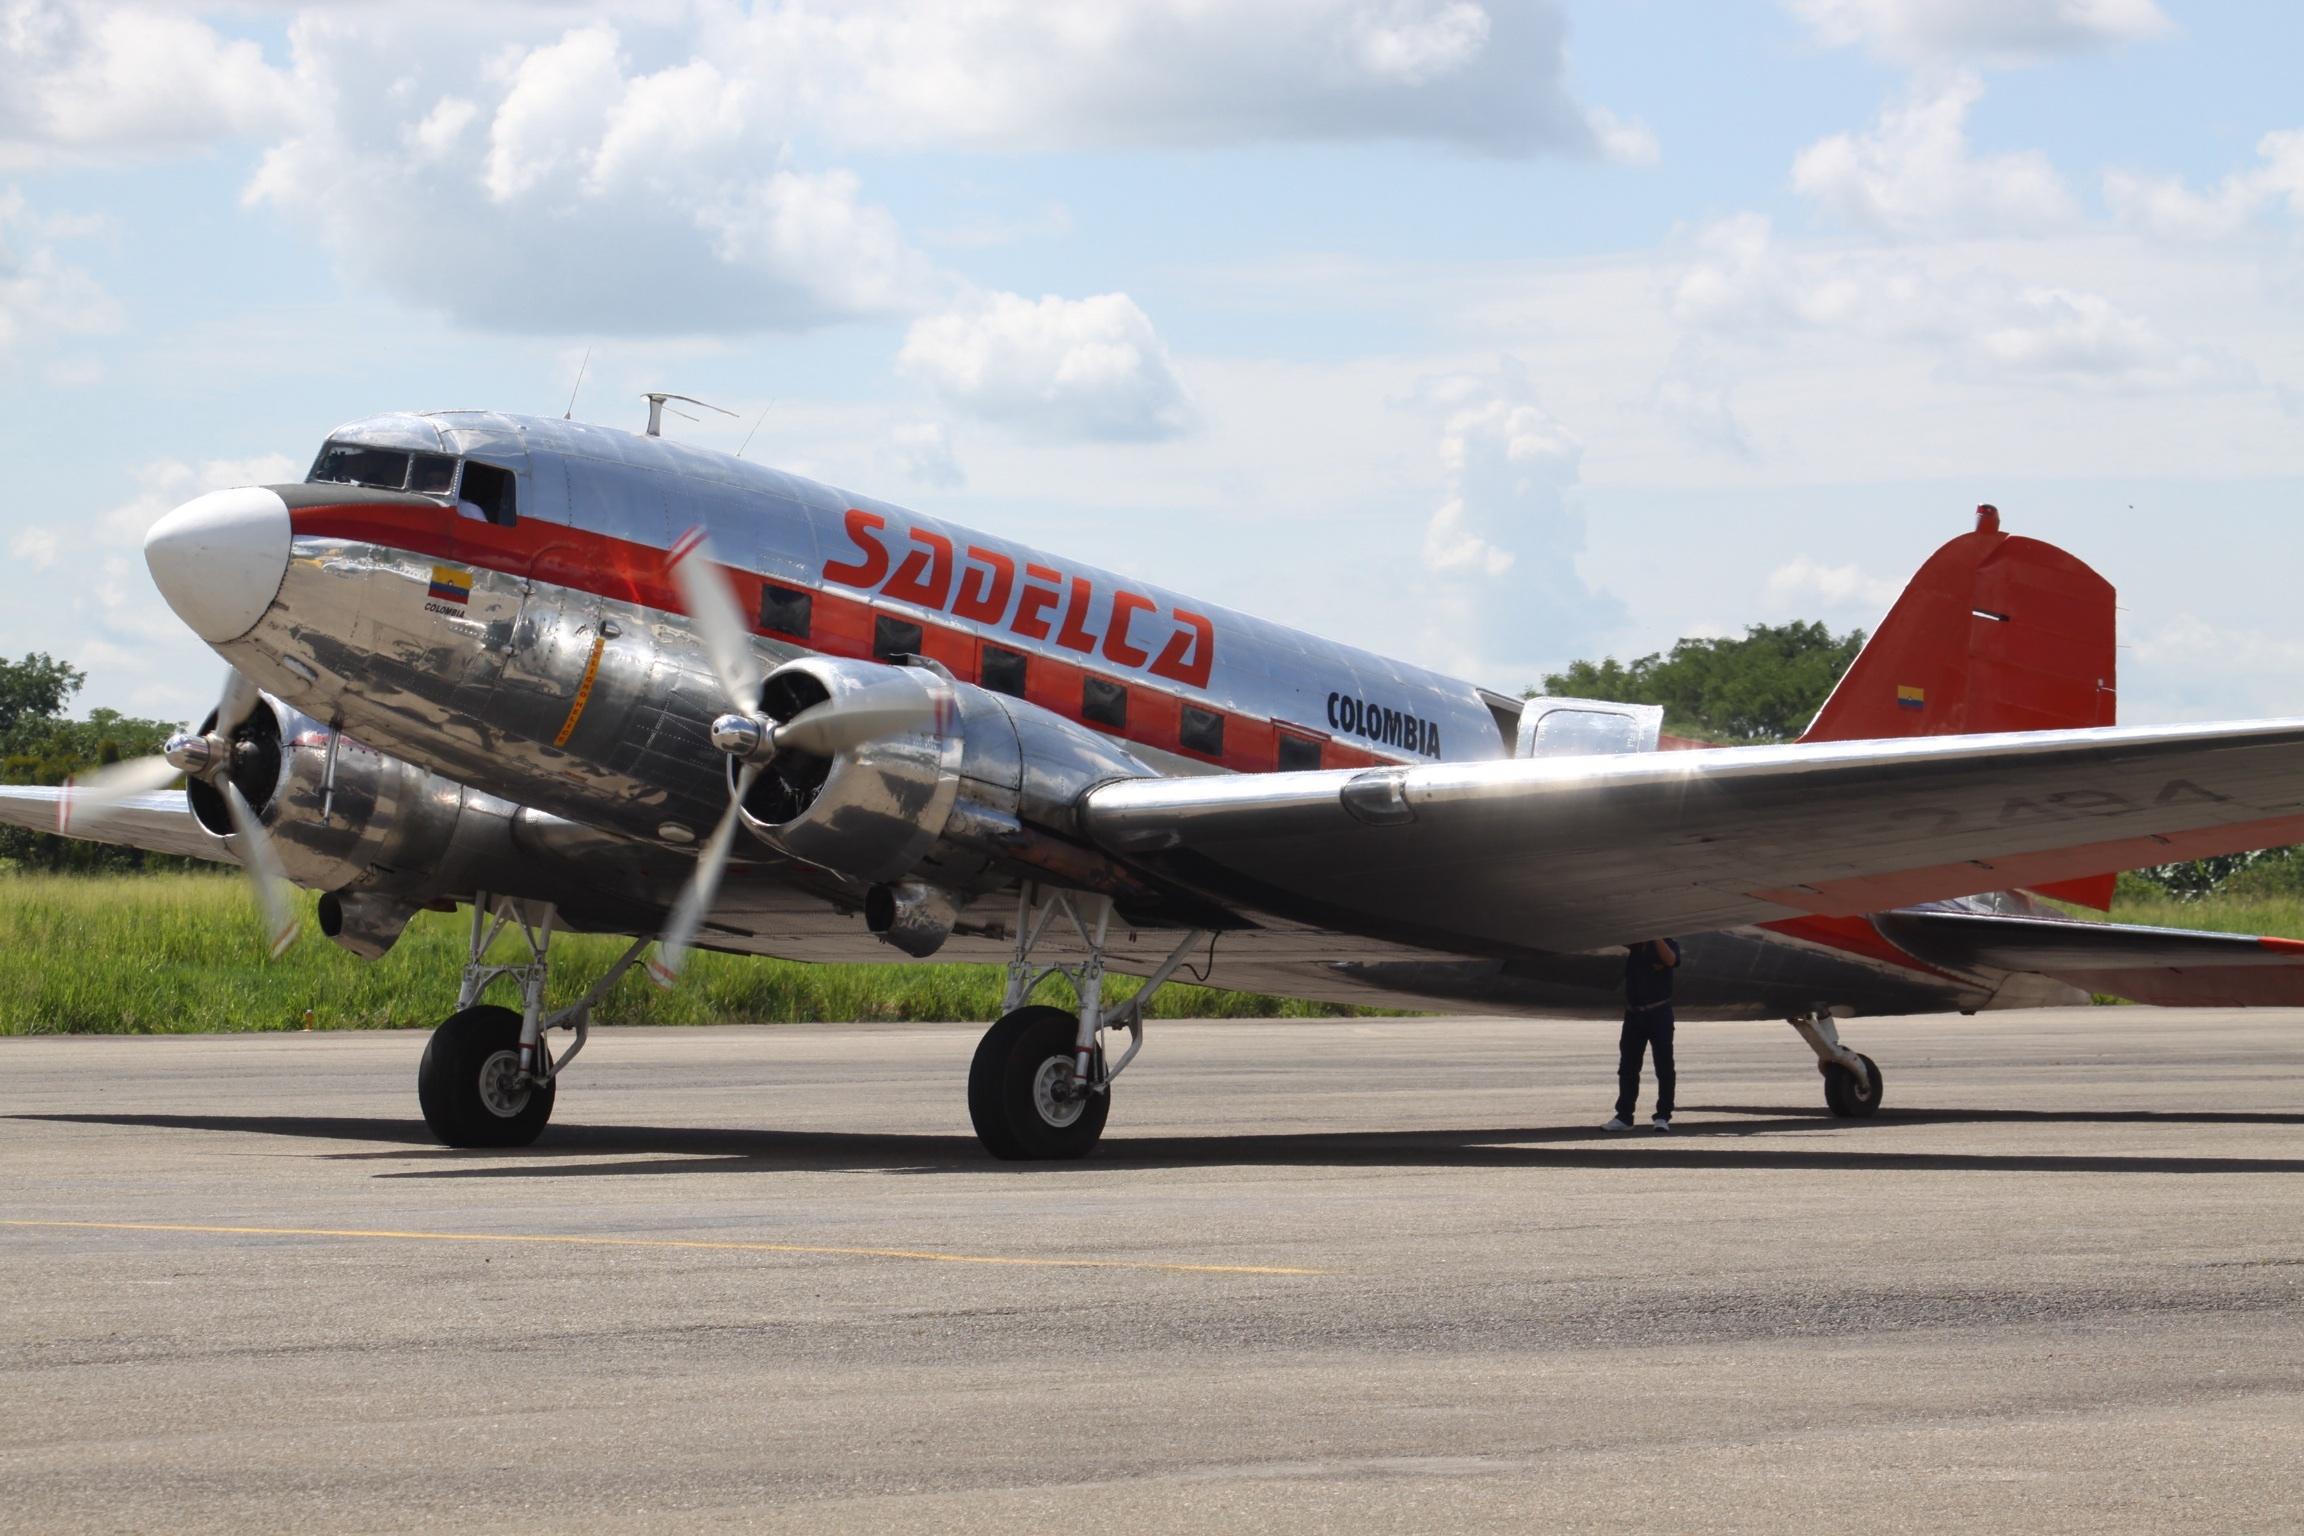 File:HK-2494 Douglas DC-3 SADELCA (7496097304).jpg